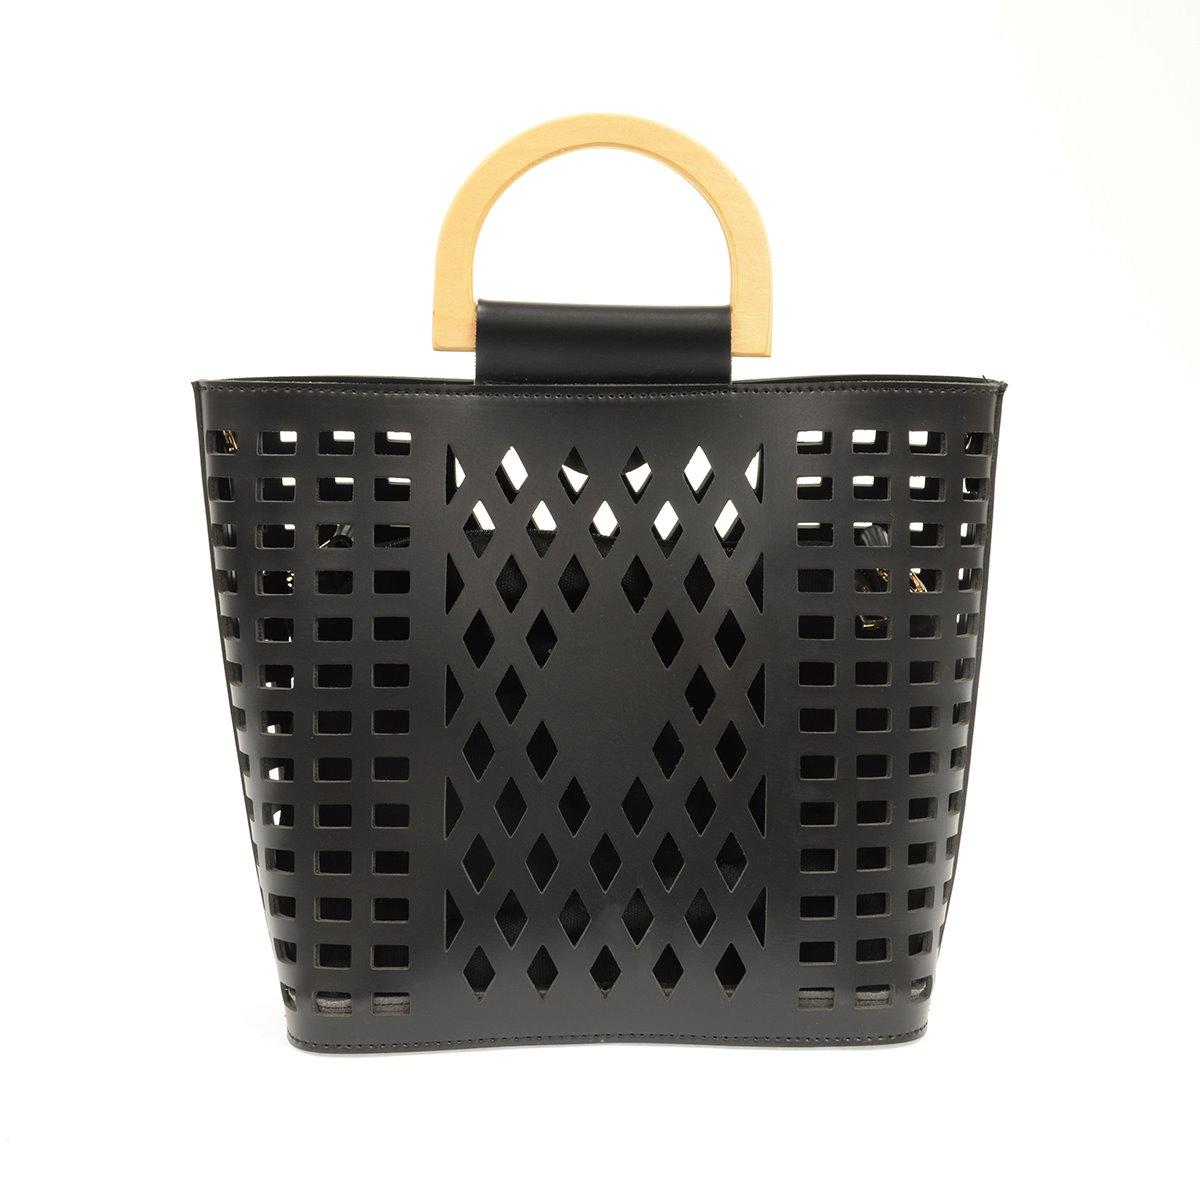 Black Madison Cut-Out Handbag Tote